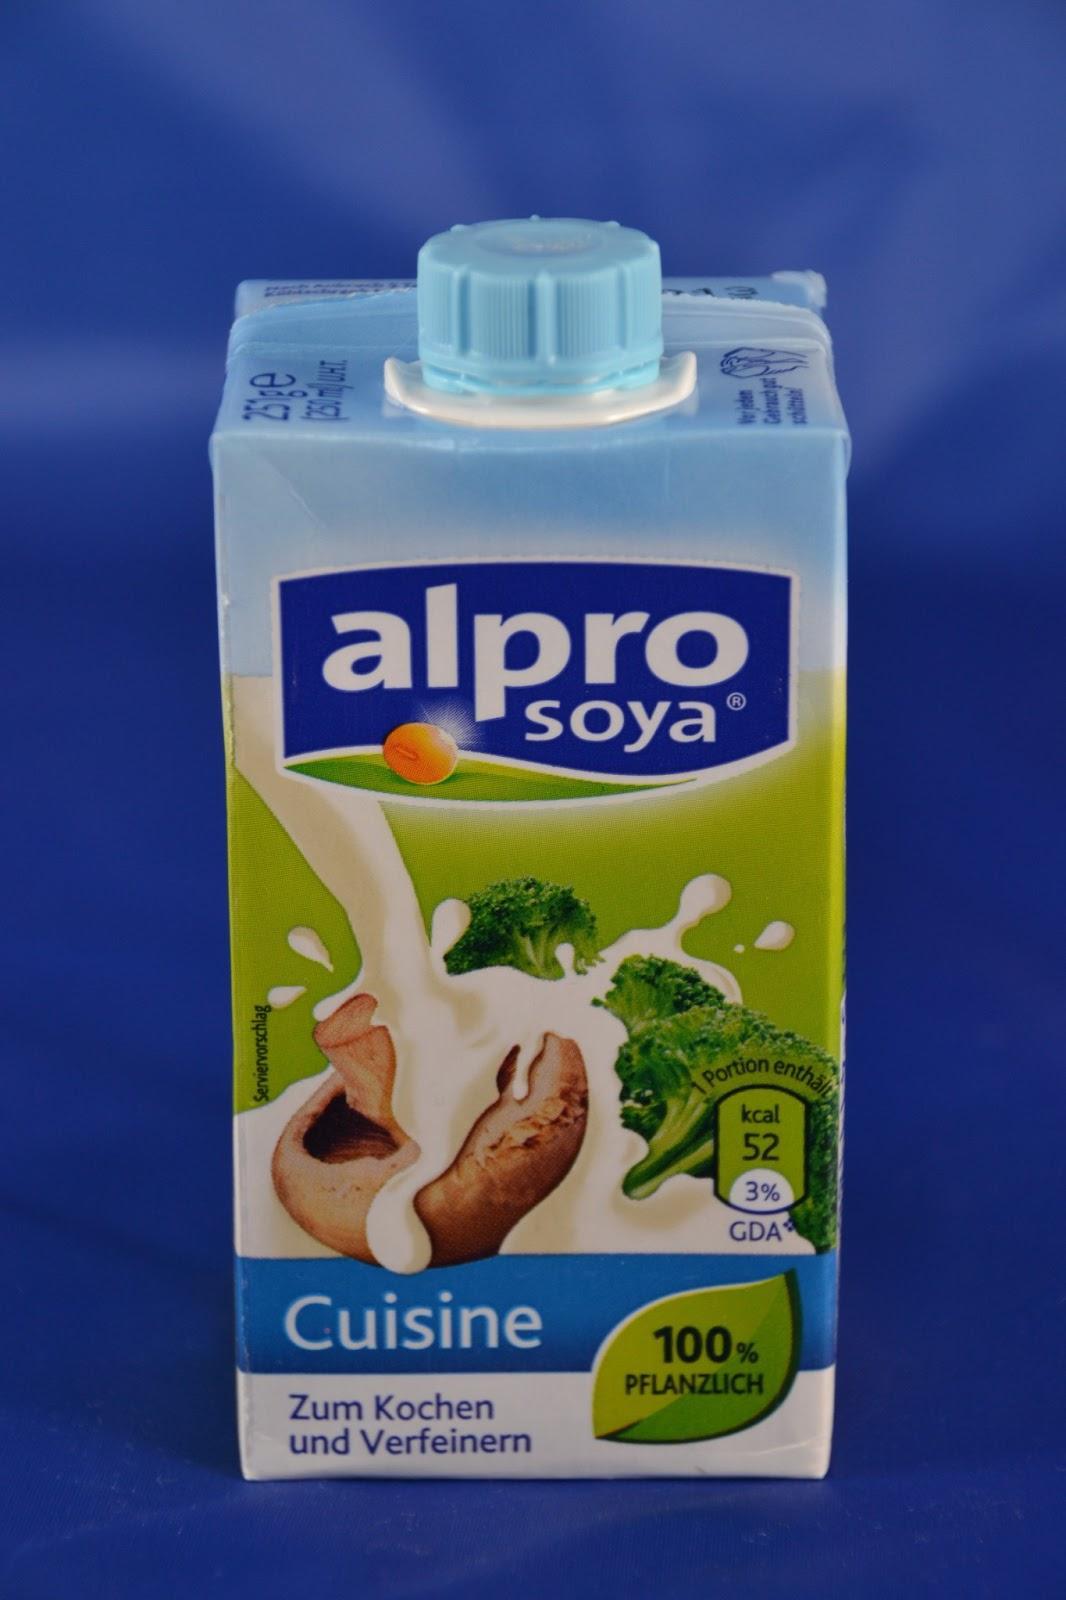 Engel testen alpro soya cuisine for Alpro soja cuisine